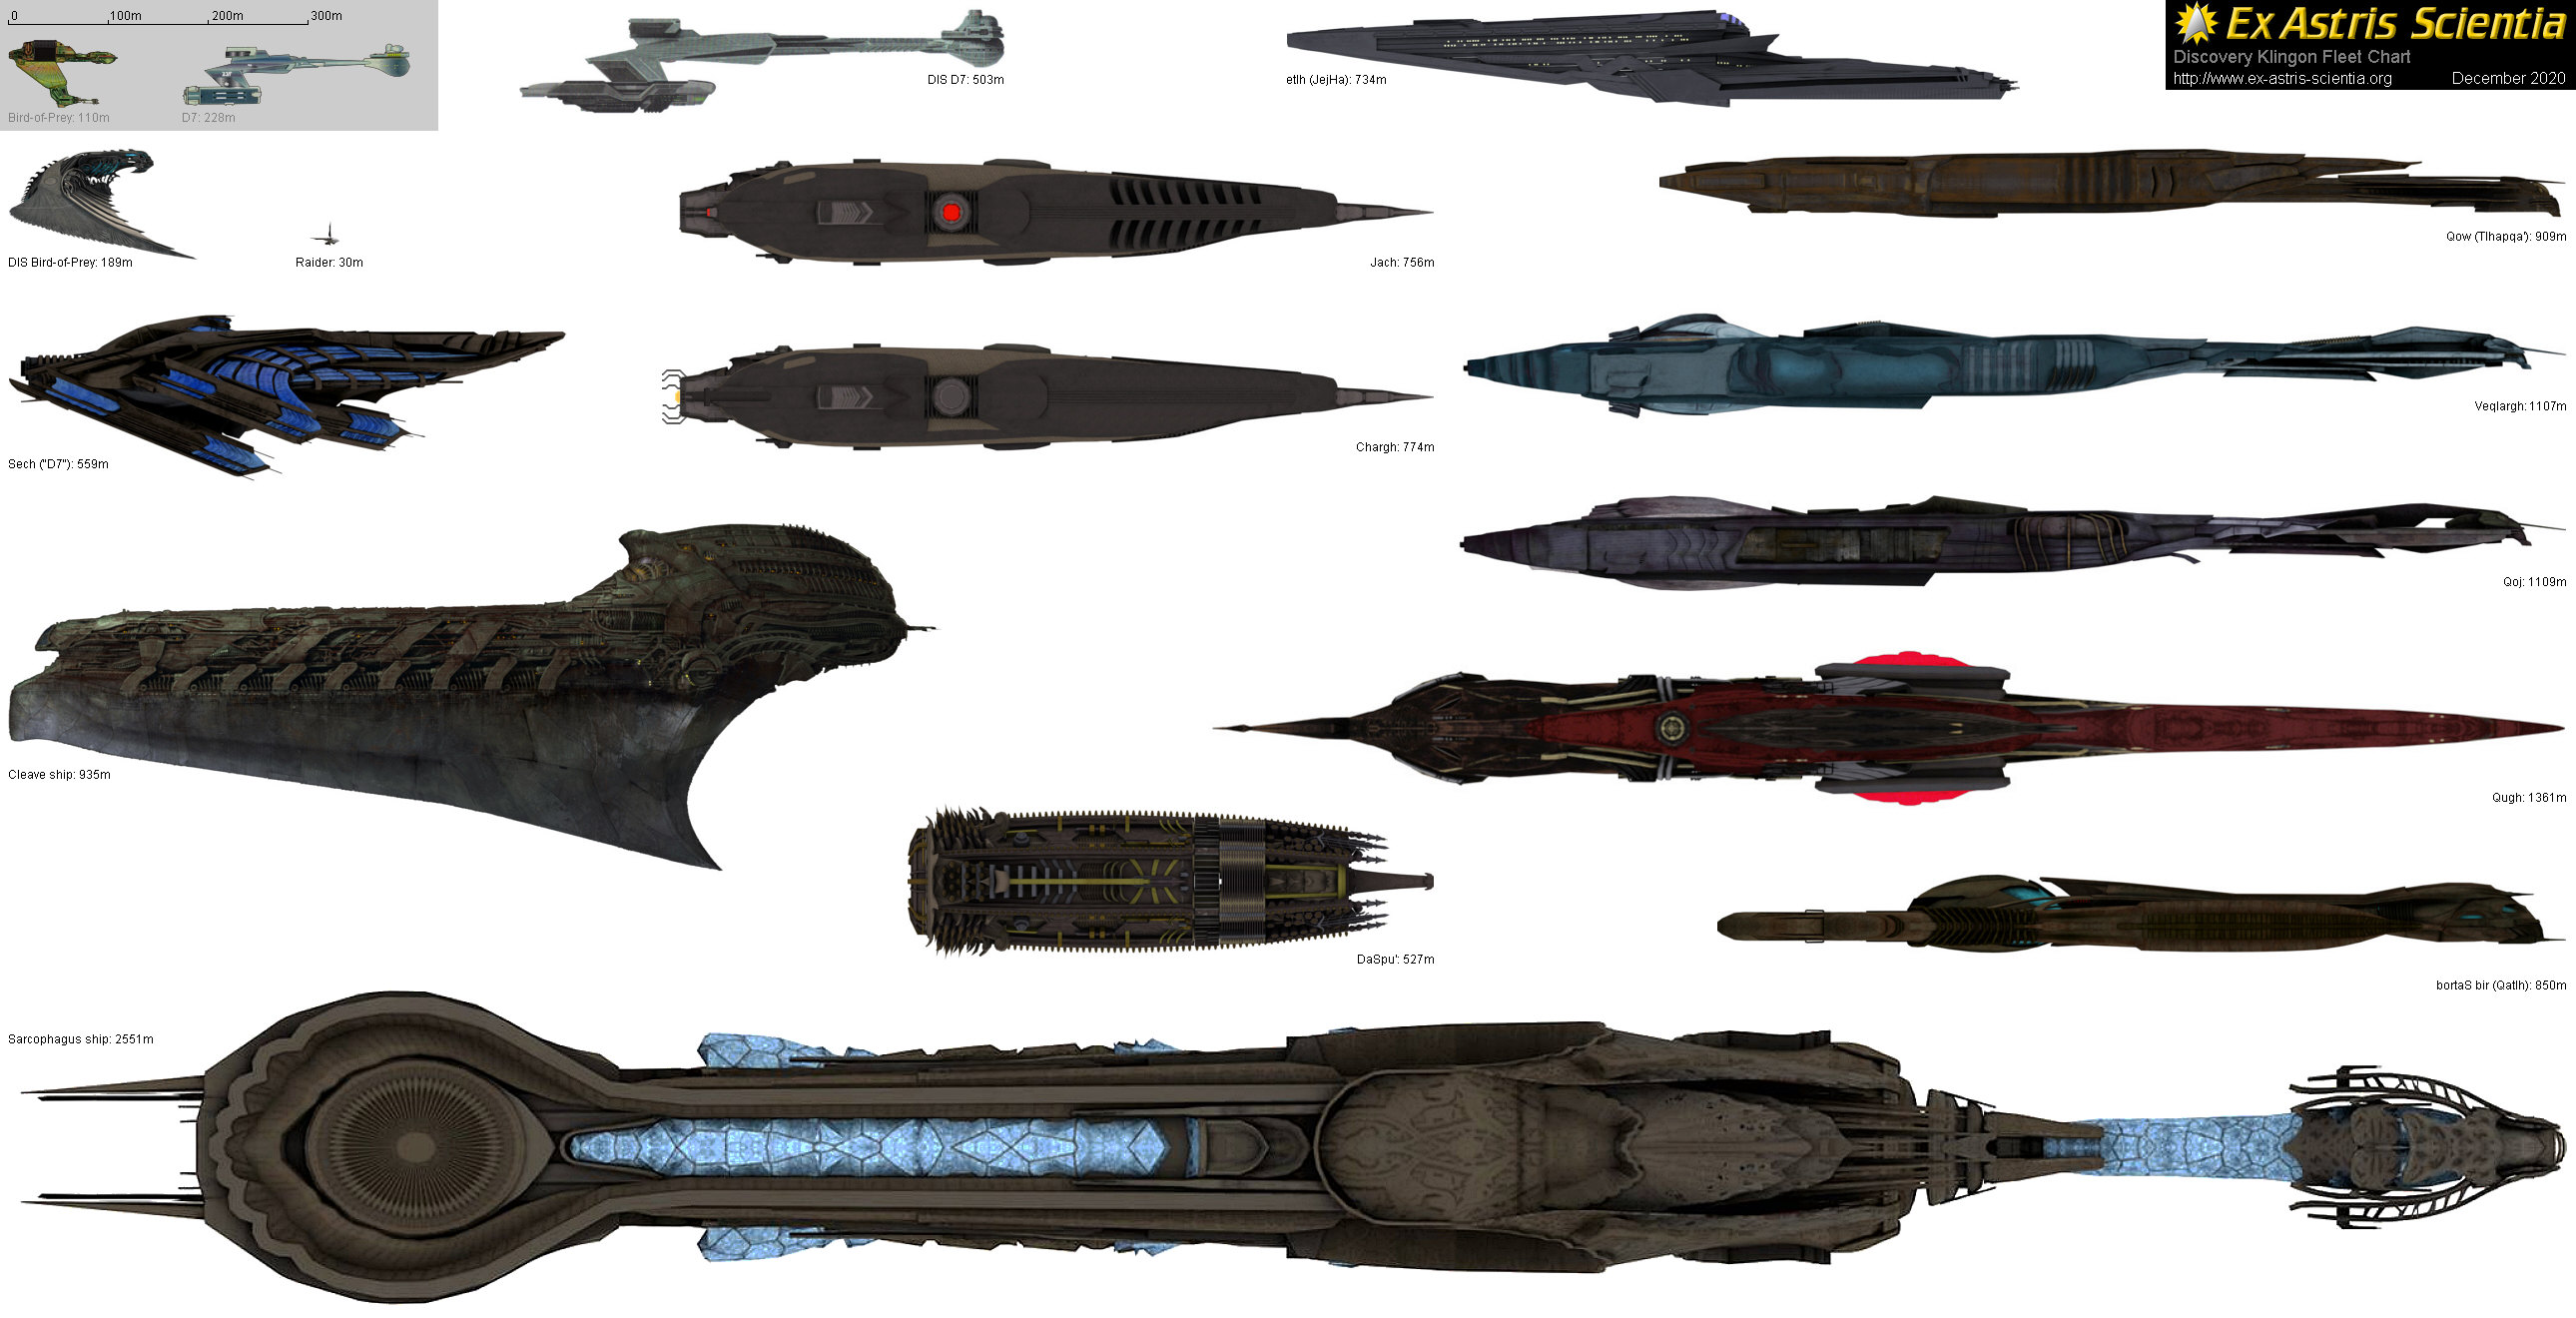 Ex Astris Scientia - Fleet Chart Annotations